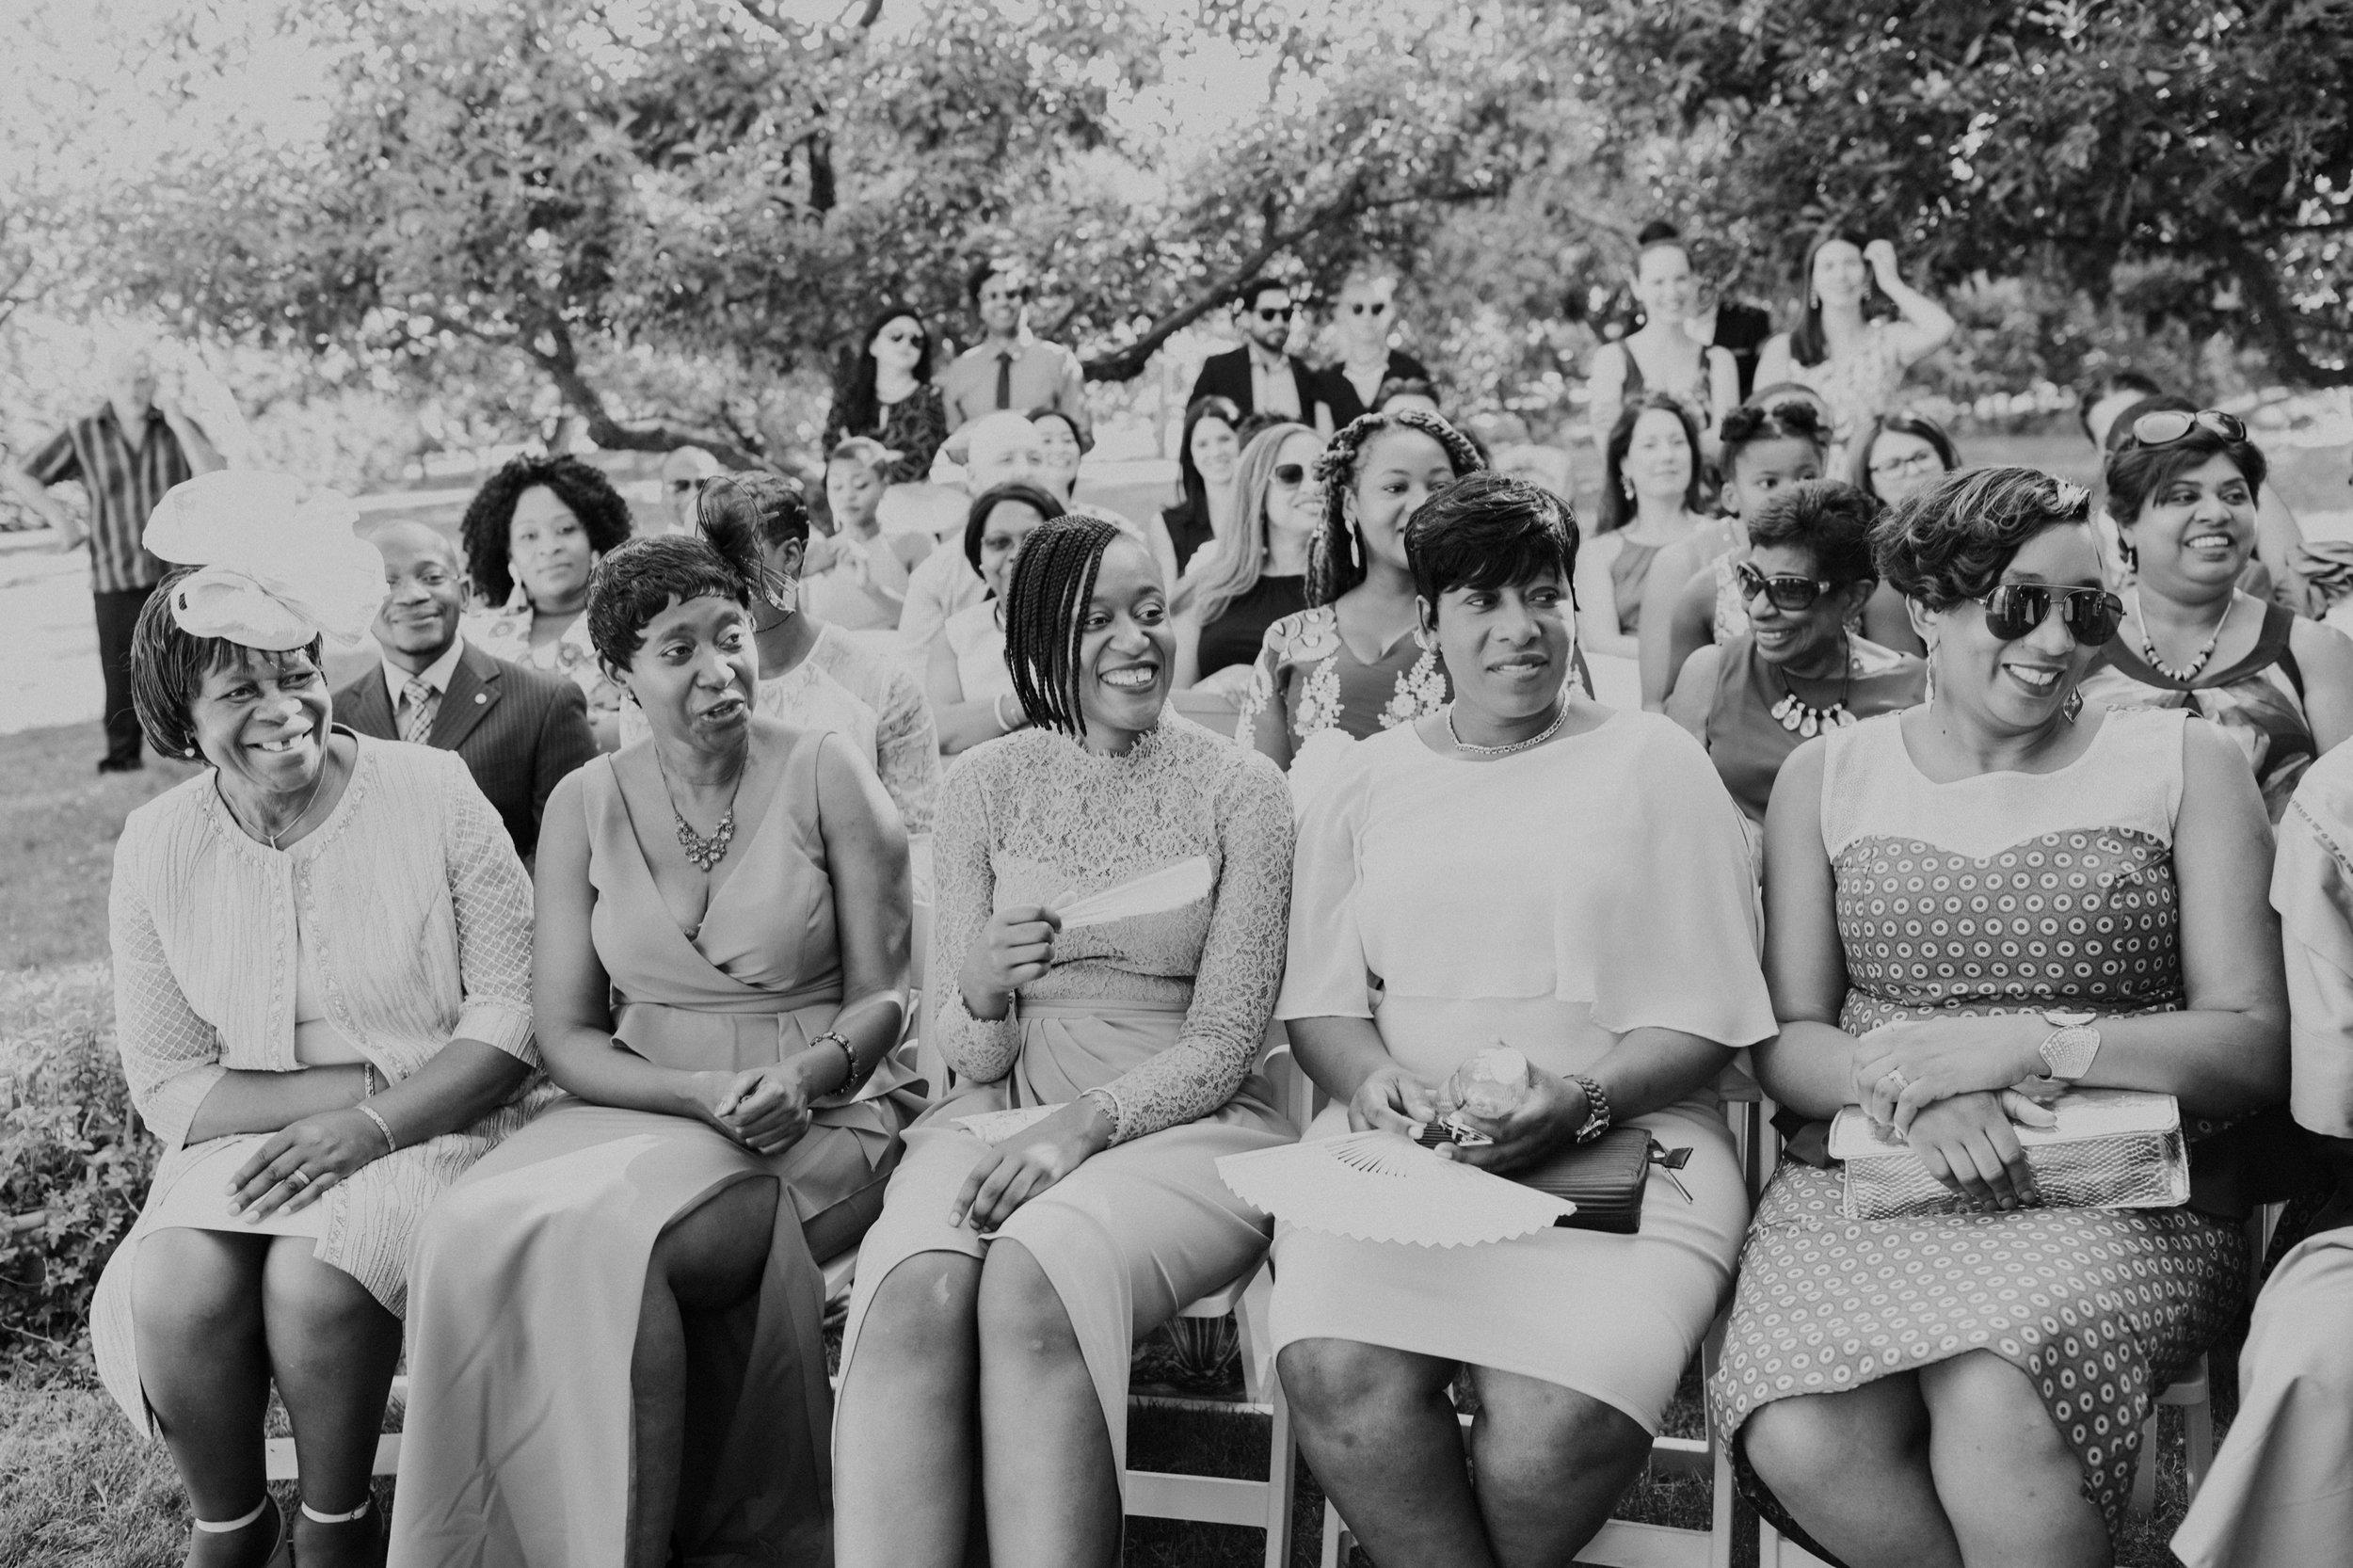 034_Spadina House Wedding (197 of 748)_House_Spadina_intimate_Toronto_Wedding.jpg